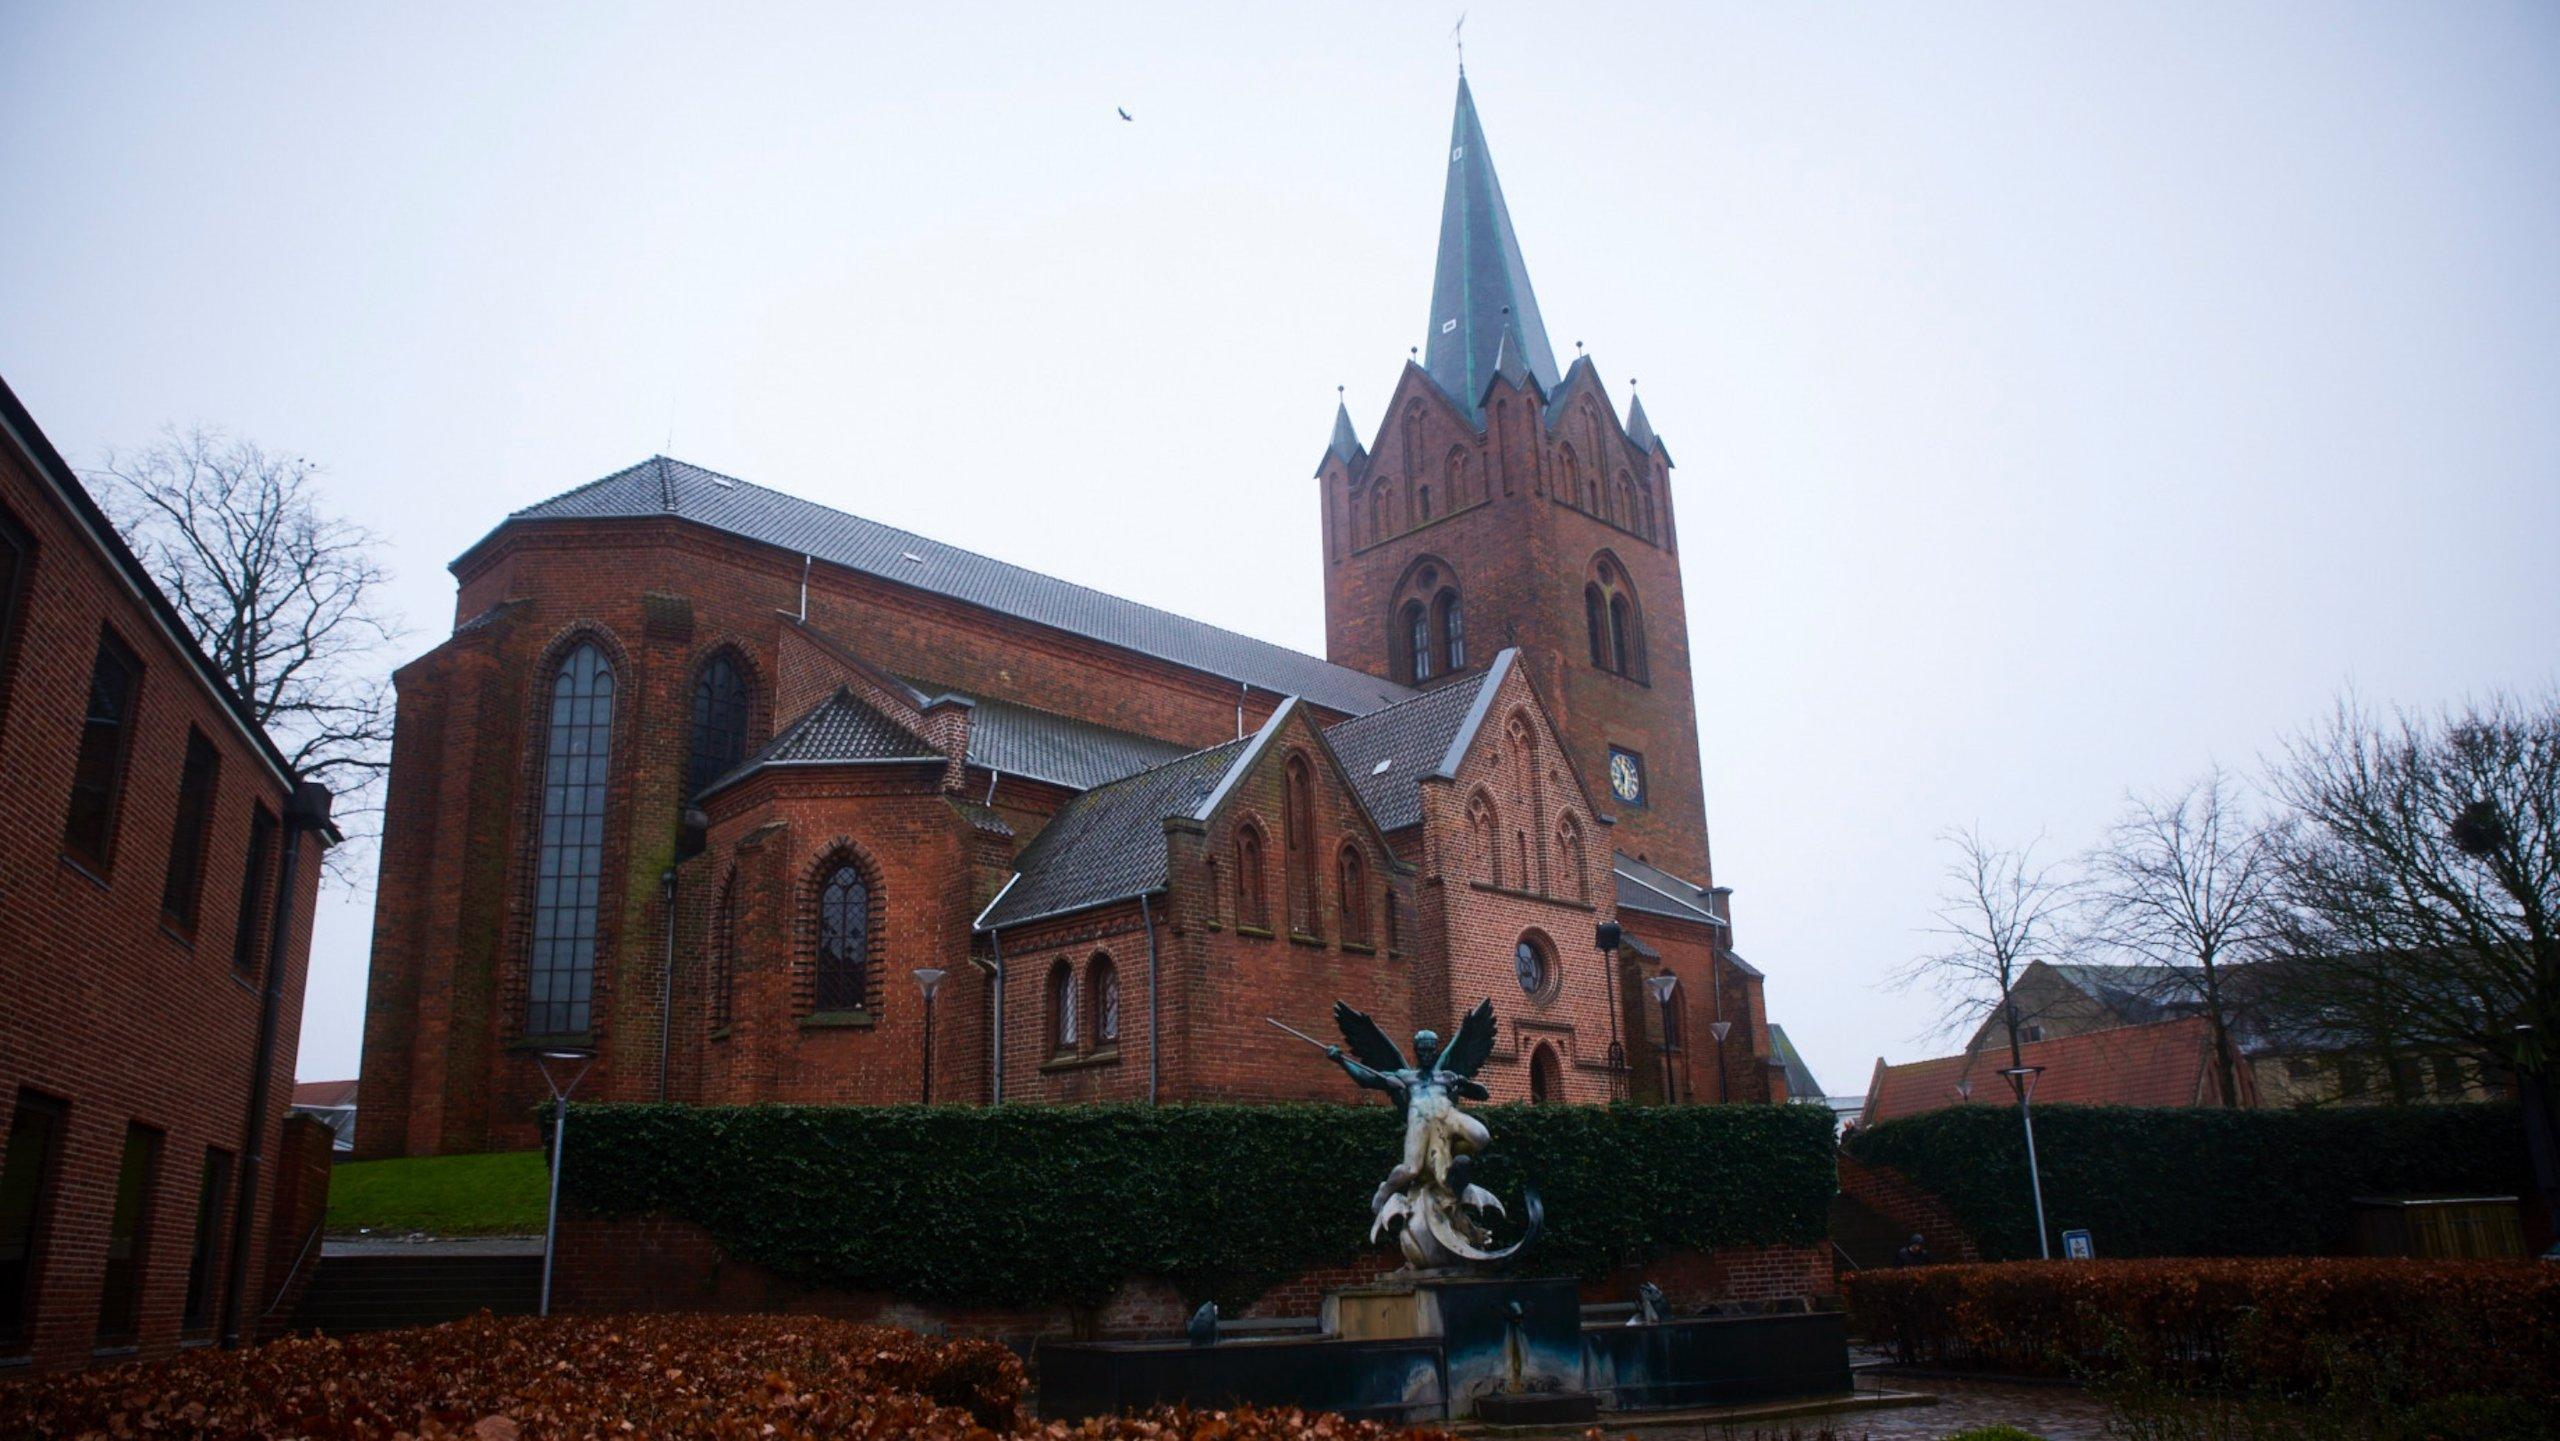 Slagelse Municipality, Sjaelland, Denmark